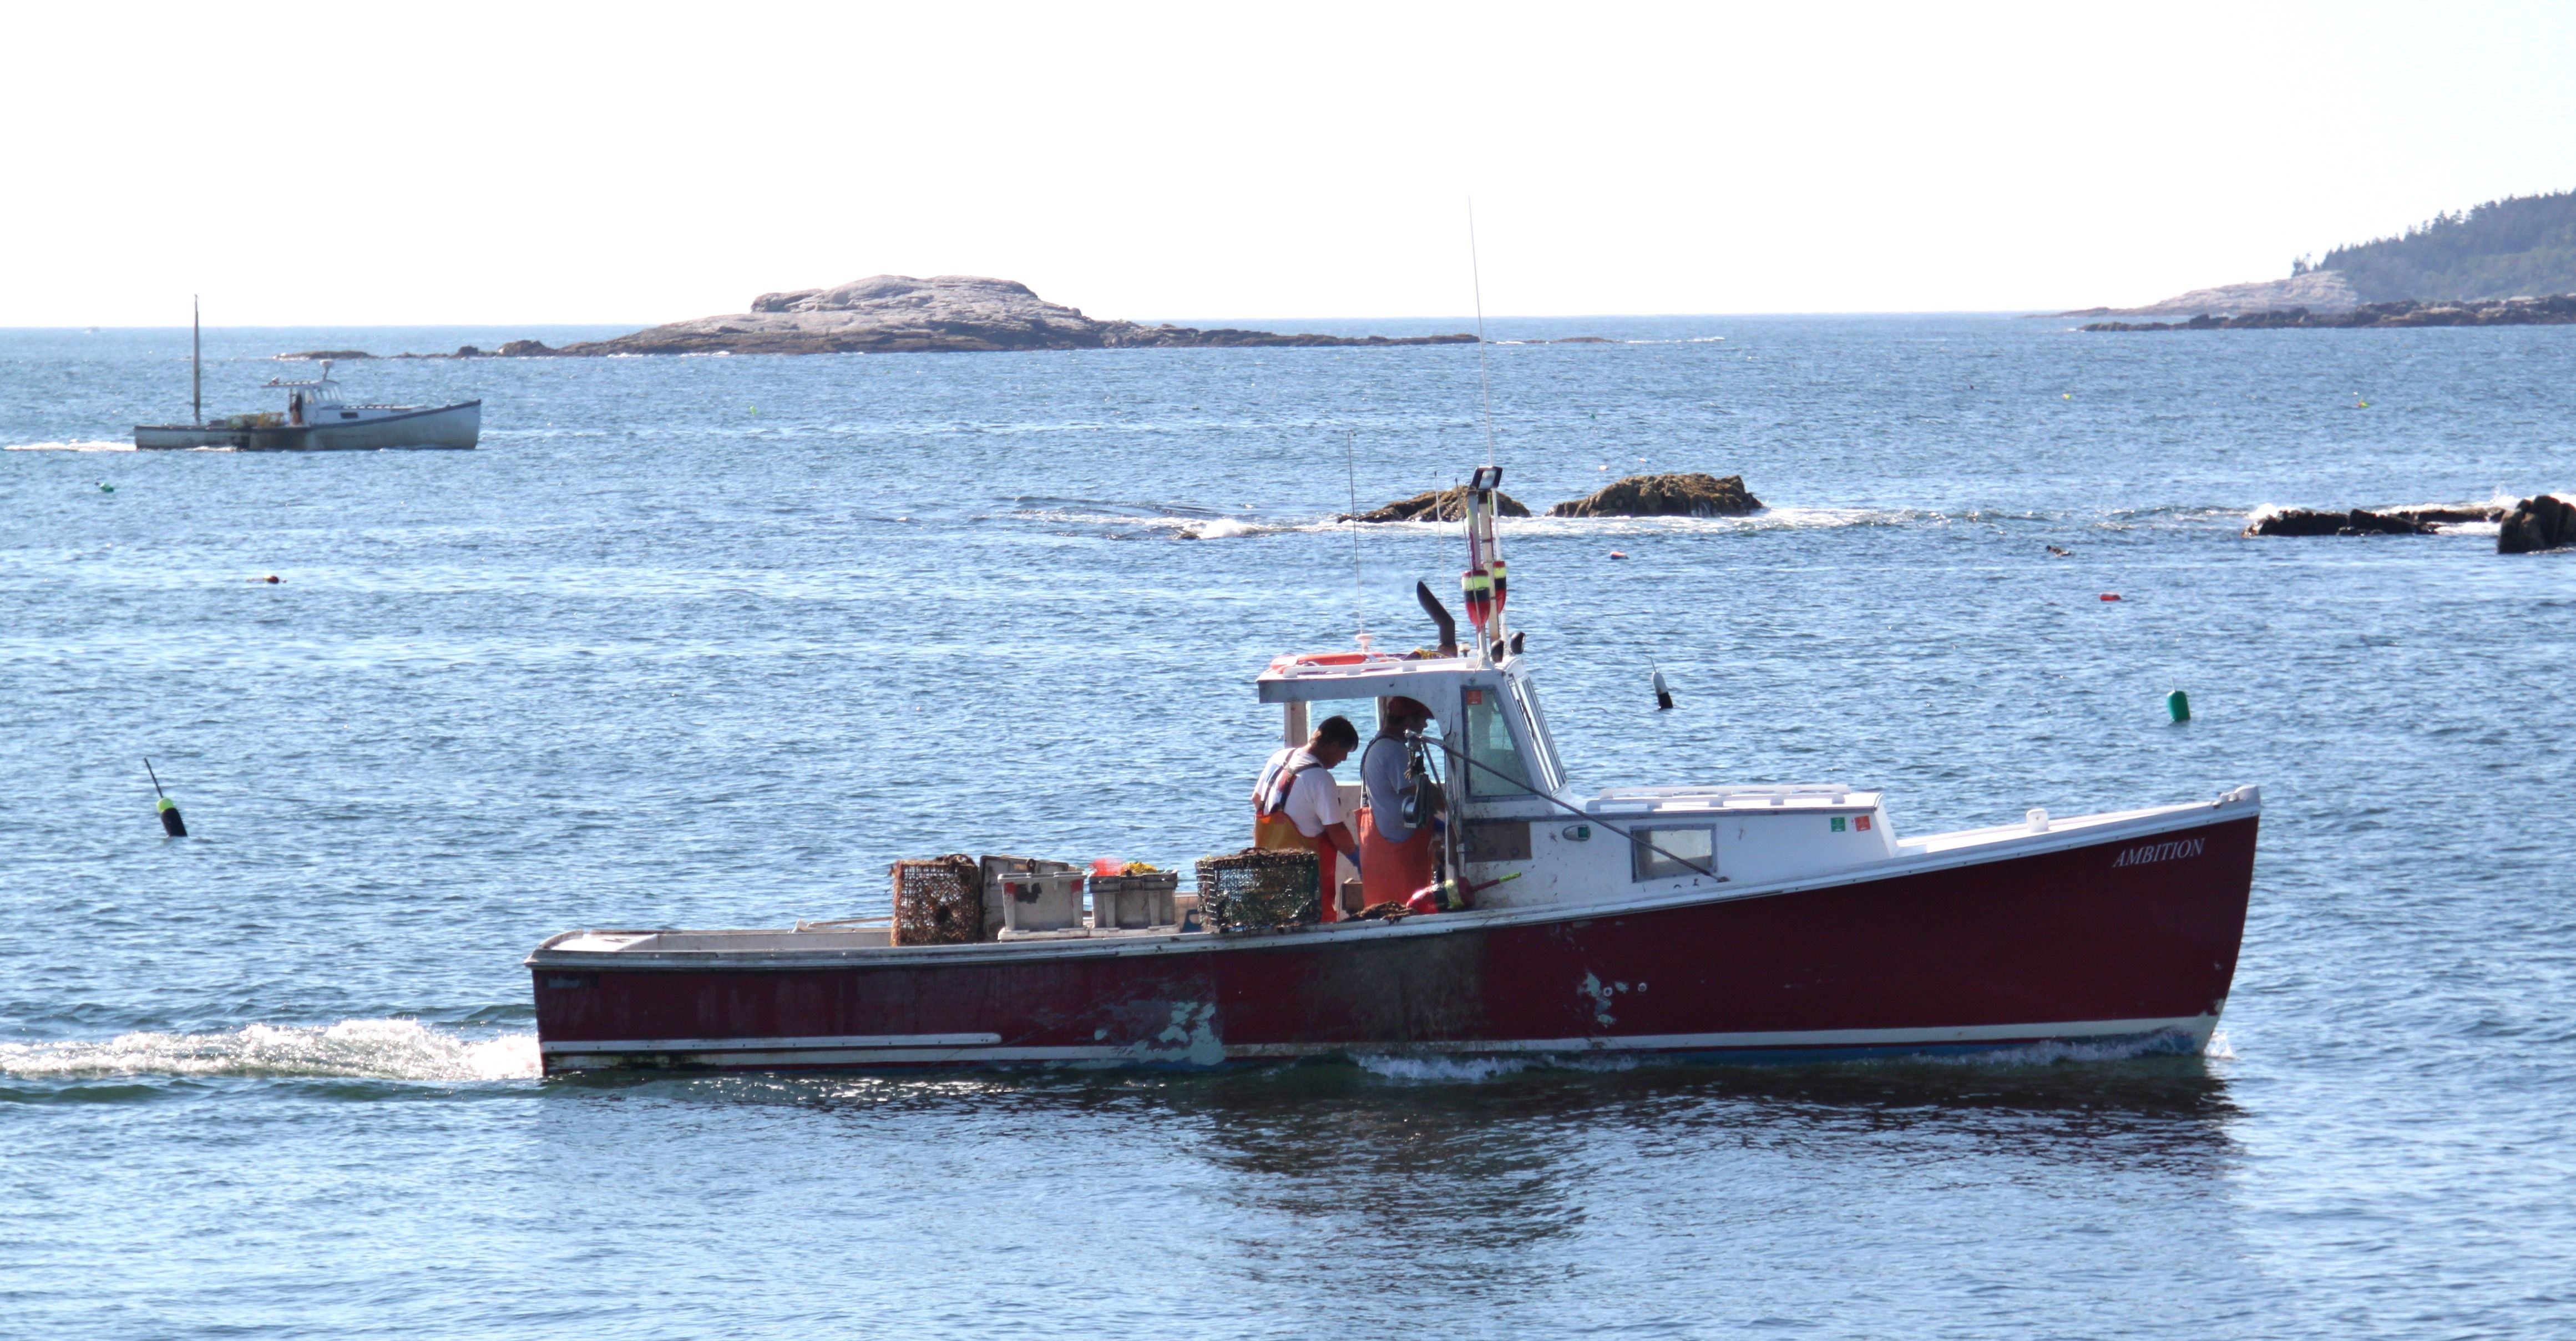 Red Lobster Boat Ocean Point Maine Boat Lobster Boat Ocean